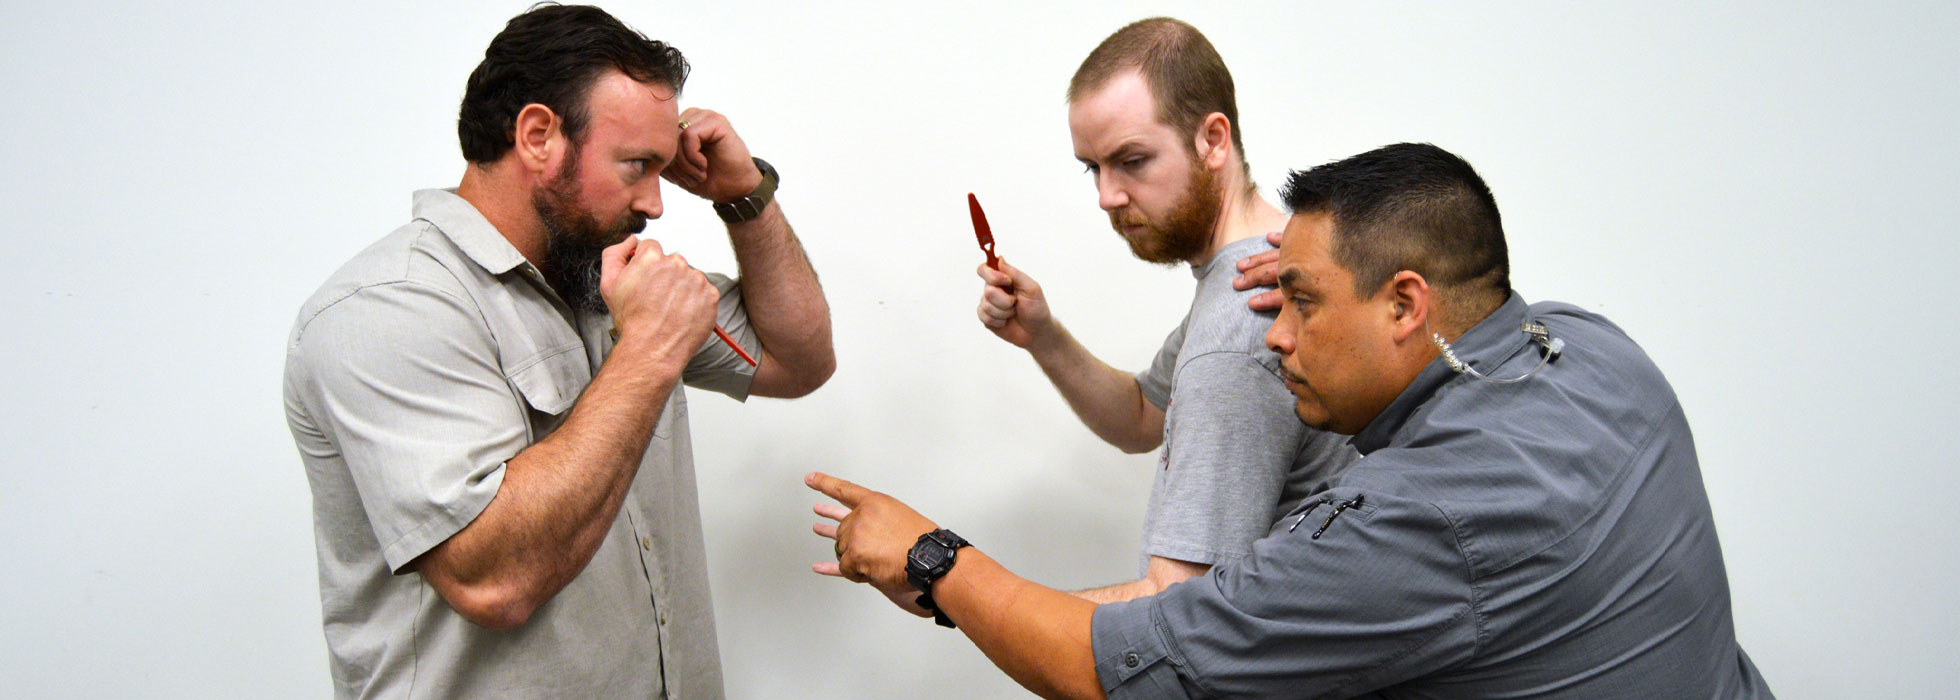 Knife Defense Classes at Athena Gun Club in Houston, TX